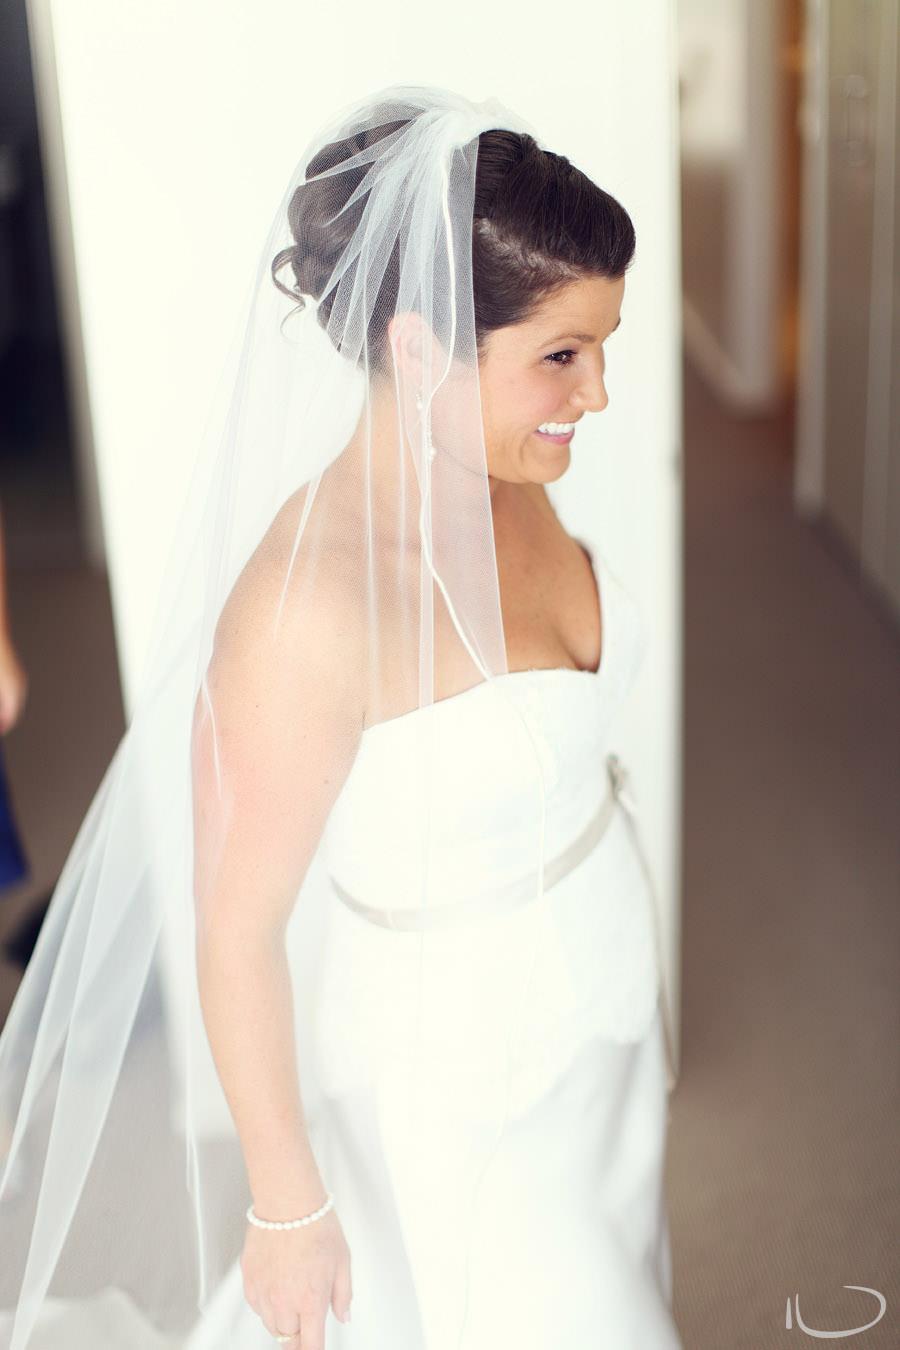 Apollo Bay Victoria Wedding Photographer: Bride excited ready to go